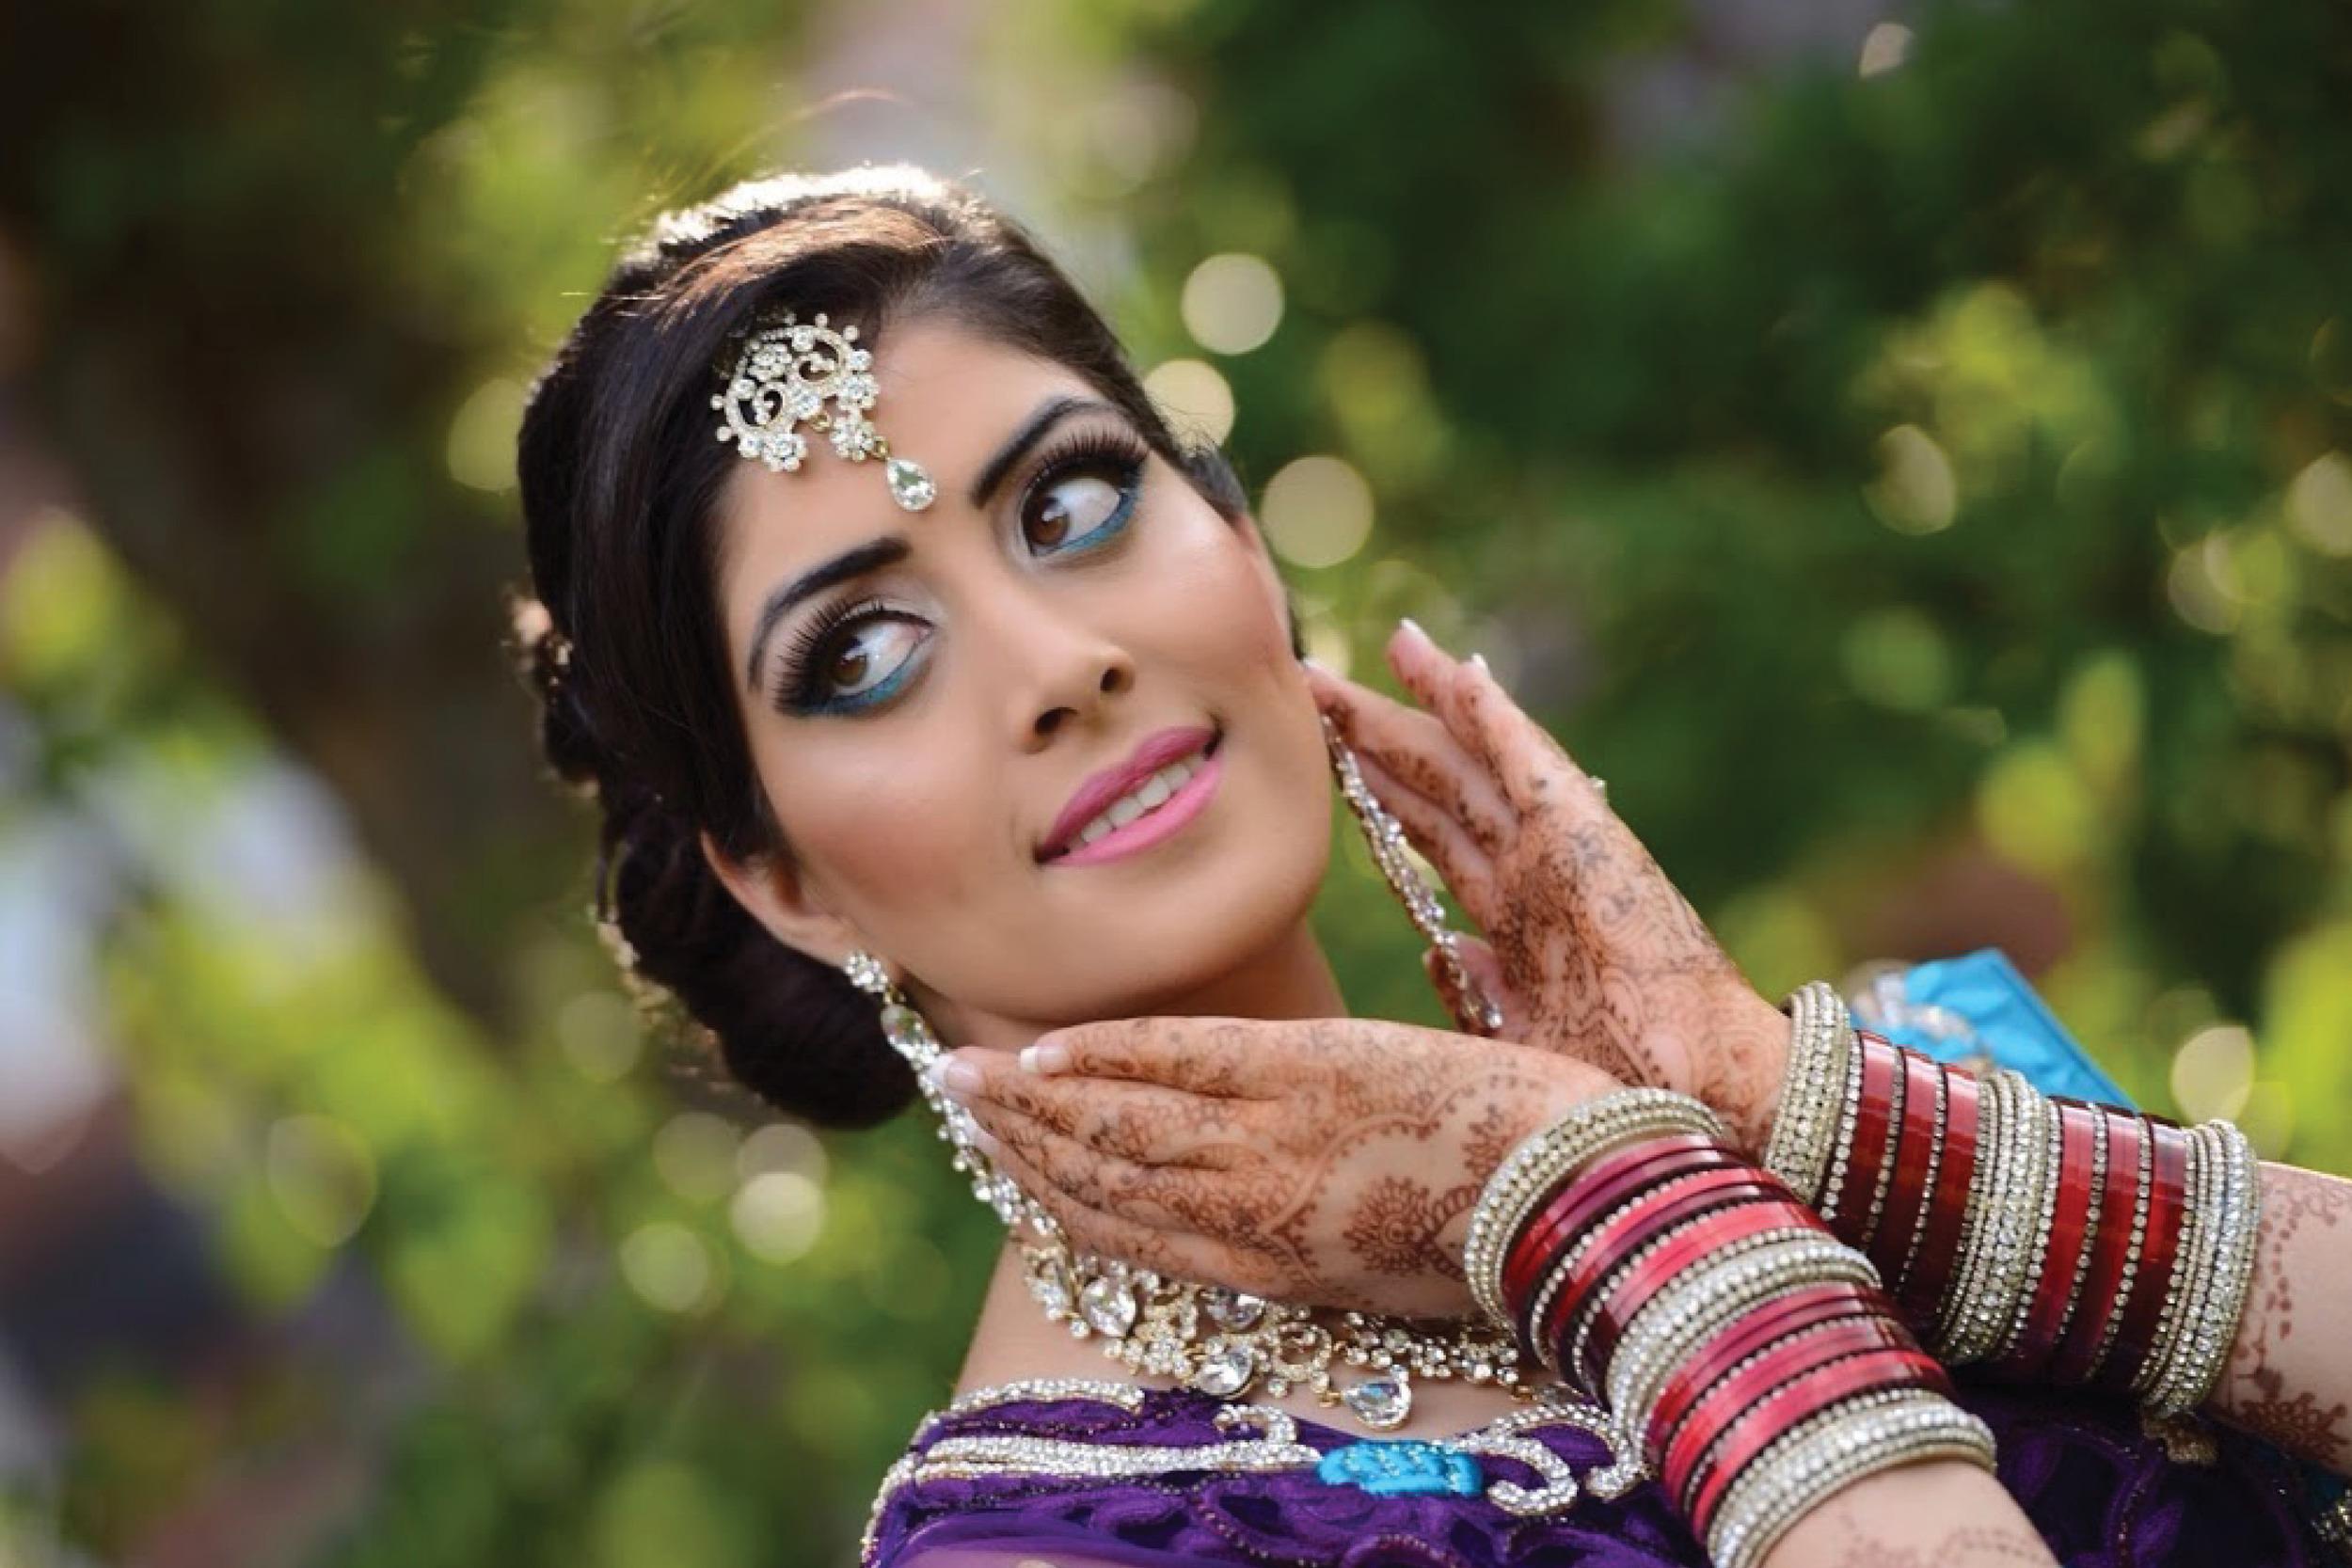 Bridal-makeup-image-233.jpg